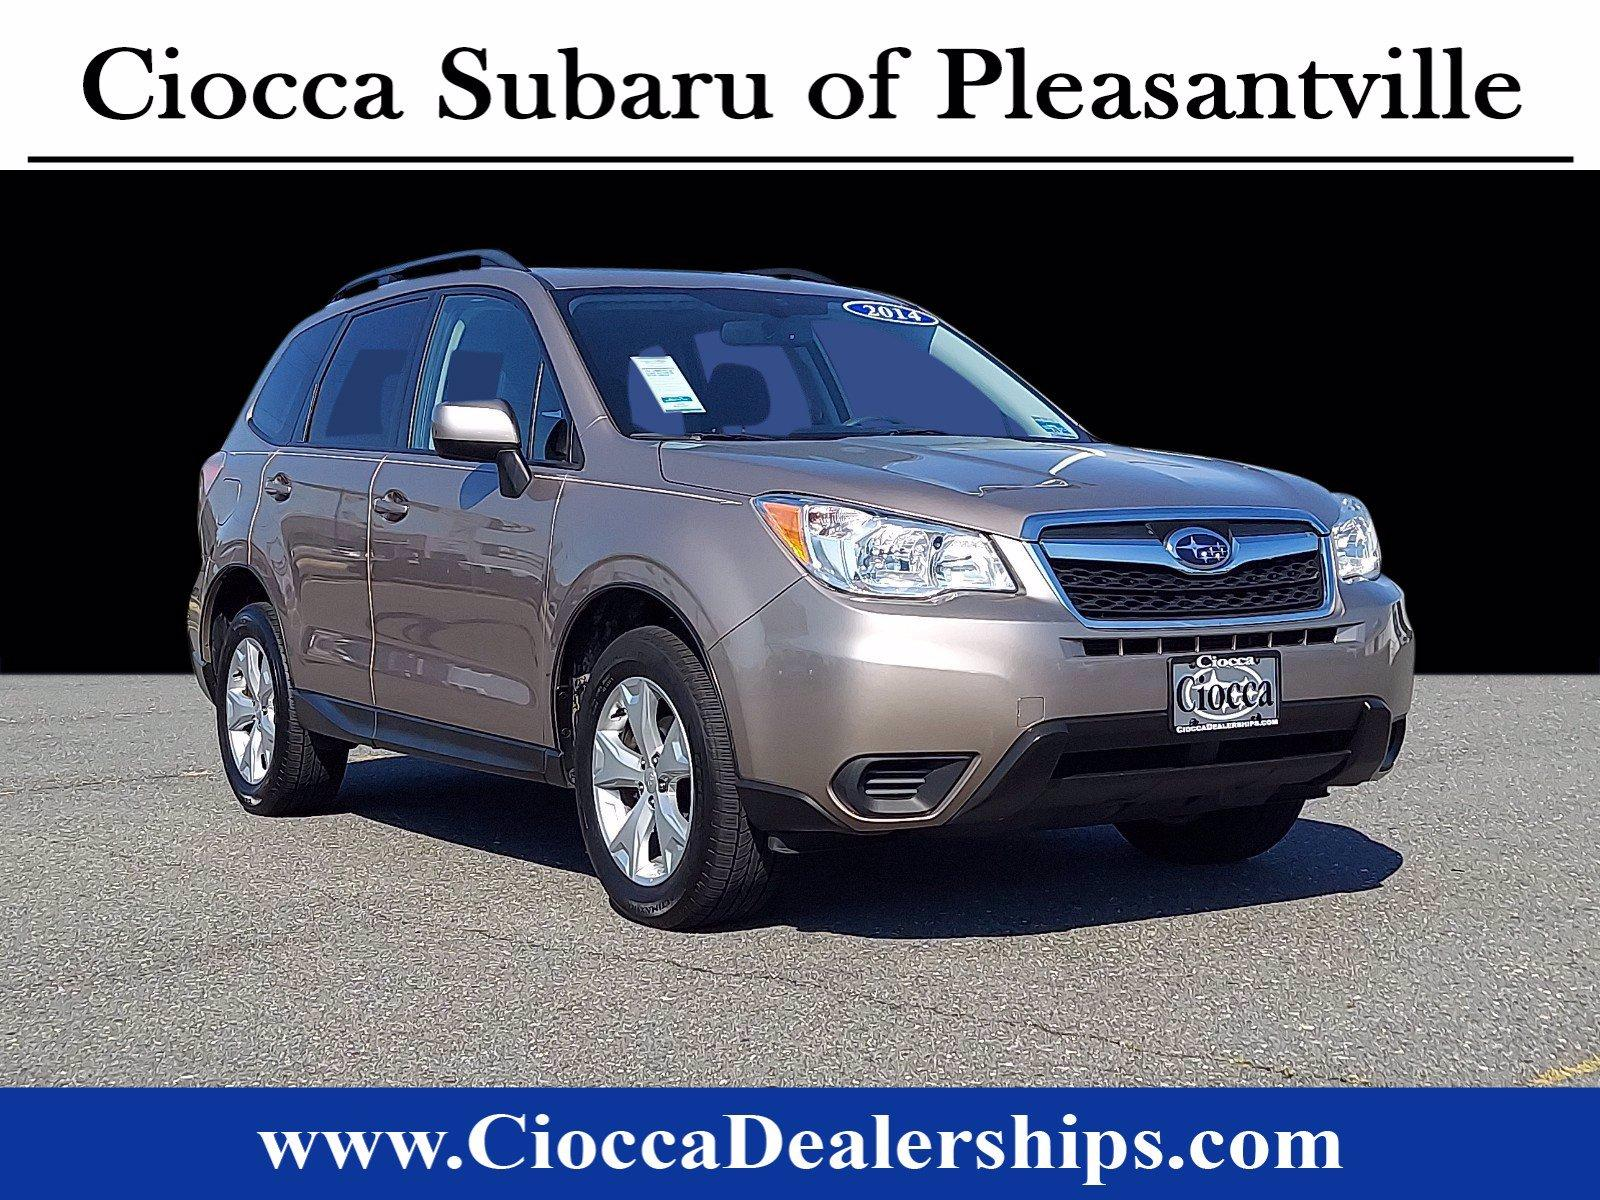 2014 Subaru Forester Vehicle Photo in Pleasantville, NJ 08232